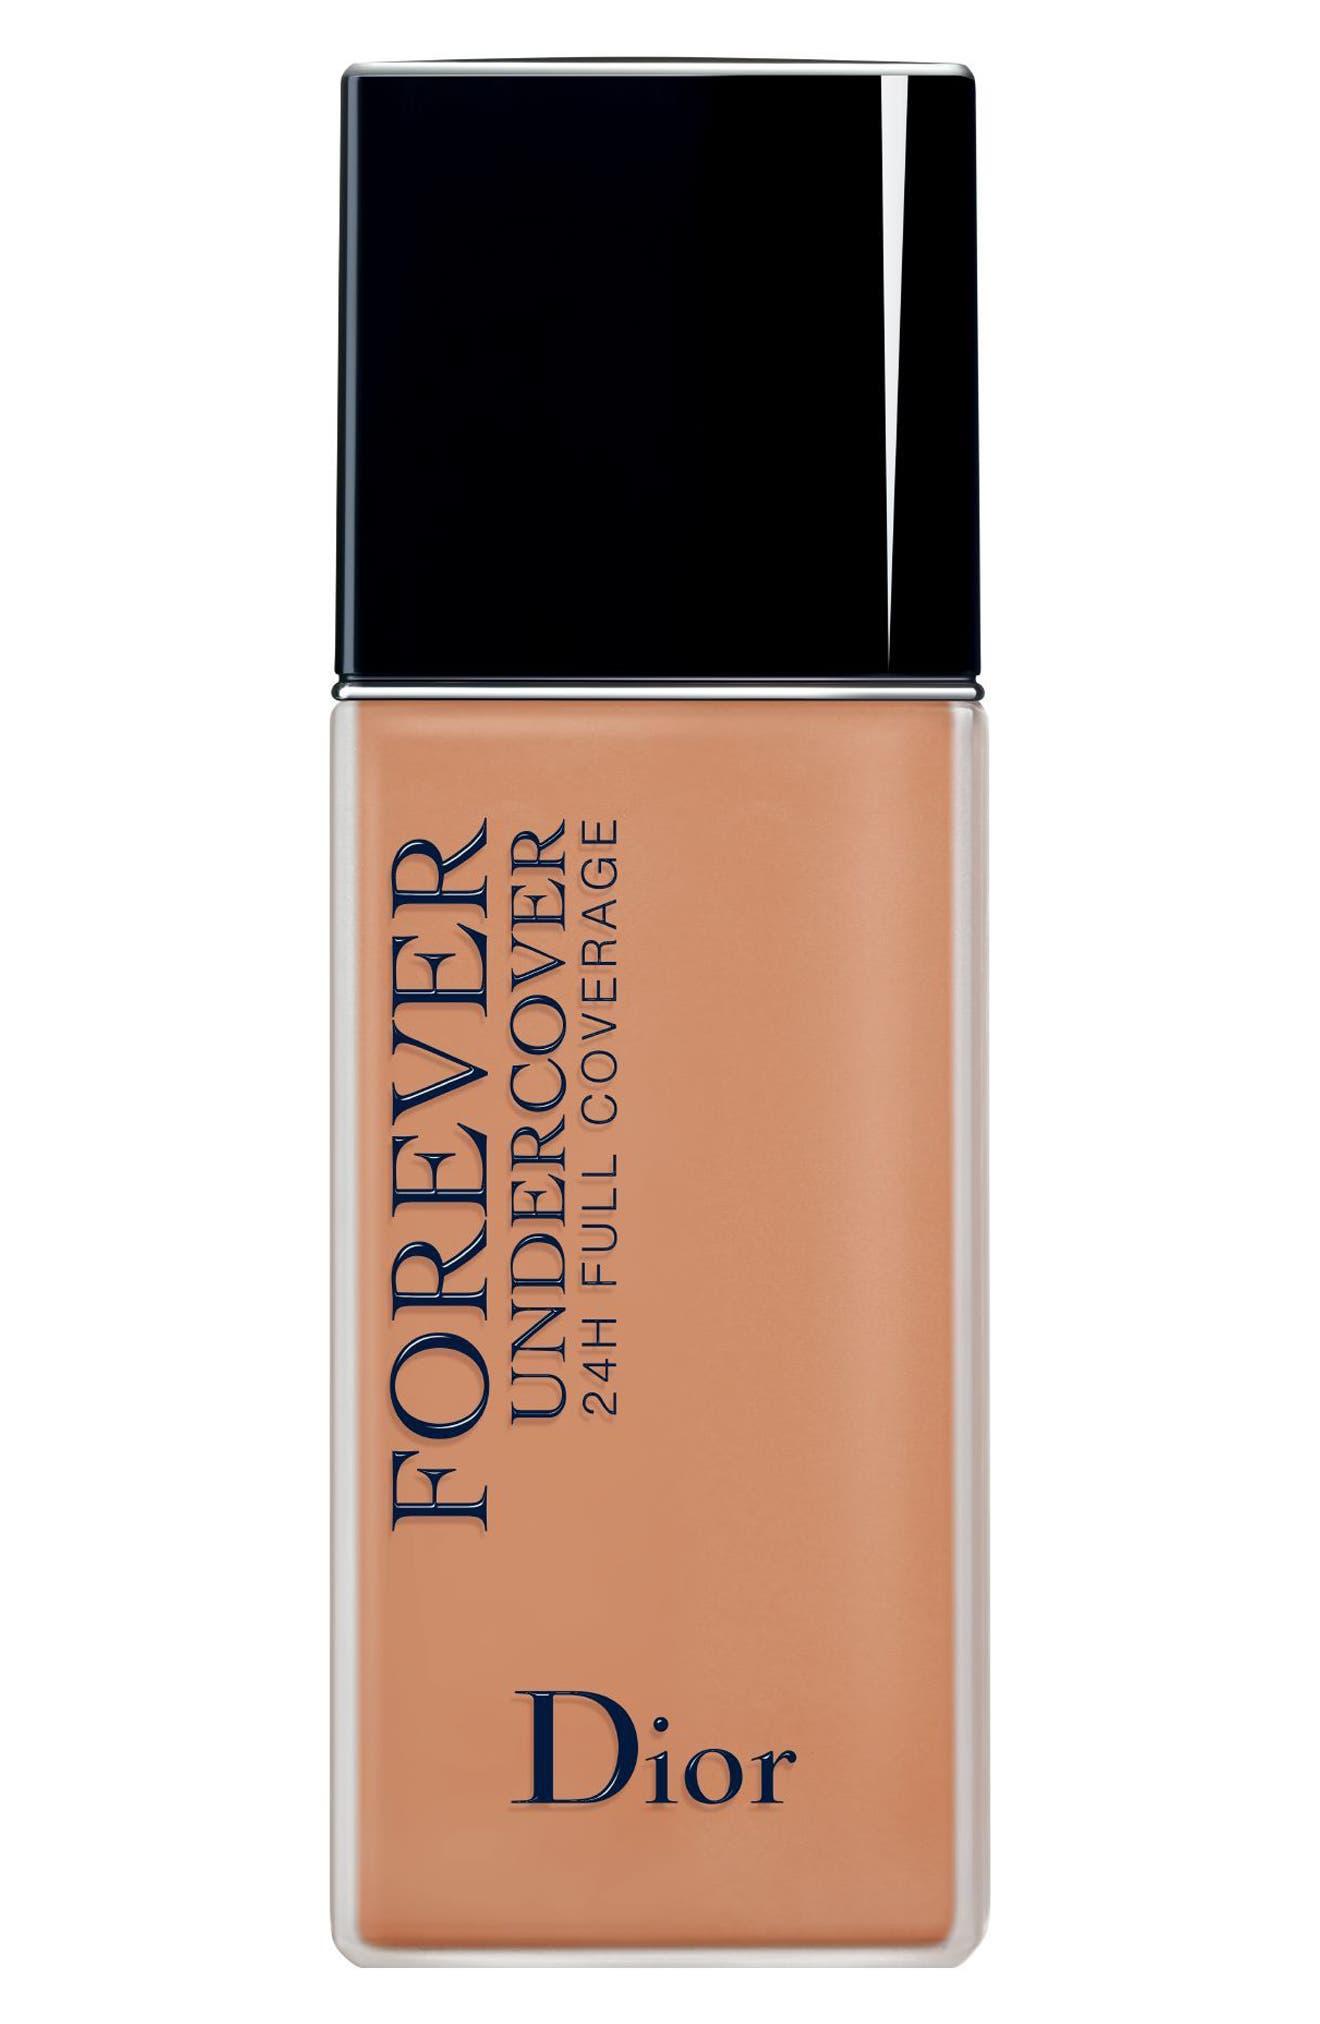 Dior Diorskin Forever Undercover 24-Hour Full Coverage Water-Based Foundation - 045 Hazel Beige